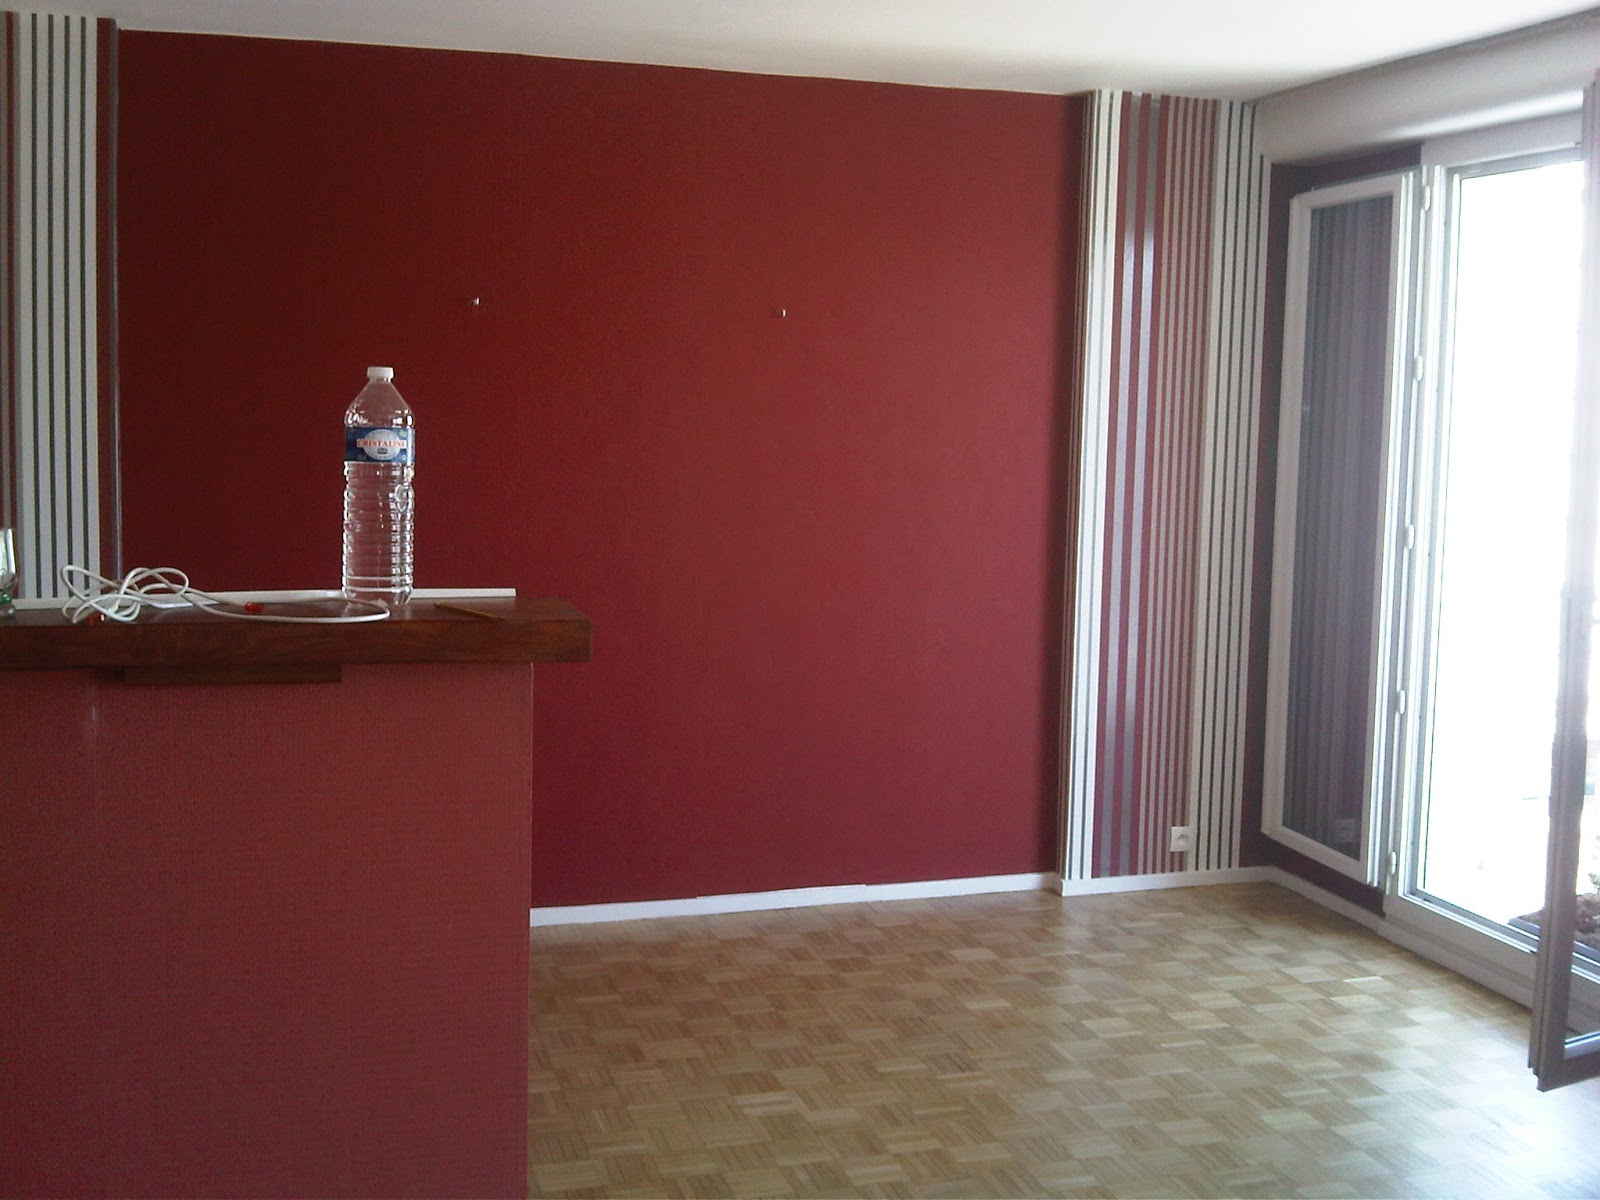 tarif peinture maison interieur ventana blog. Black Bedroom Furniture Sets. Home Design Ideas